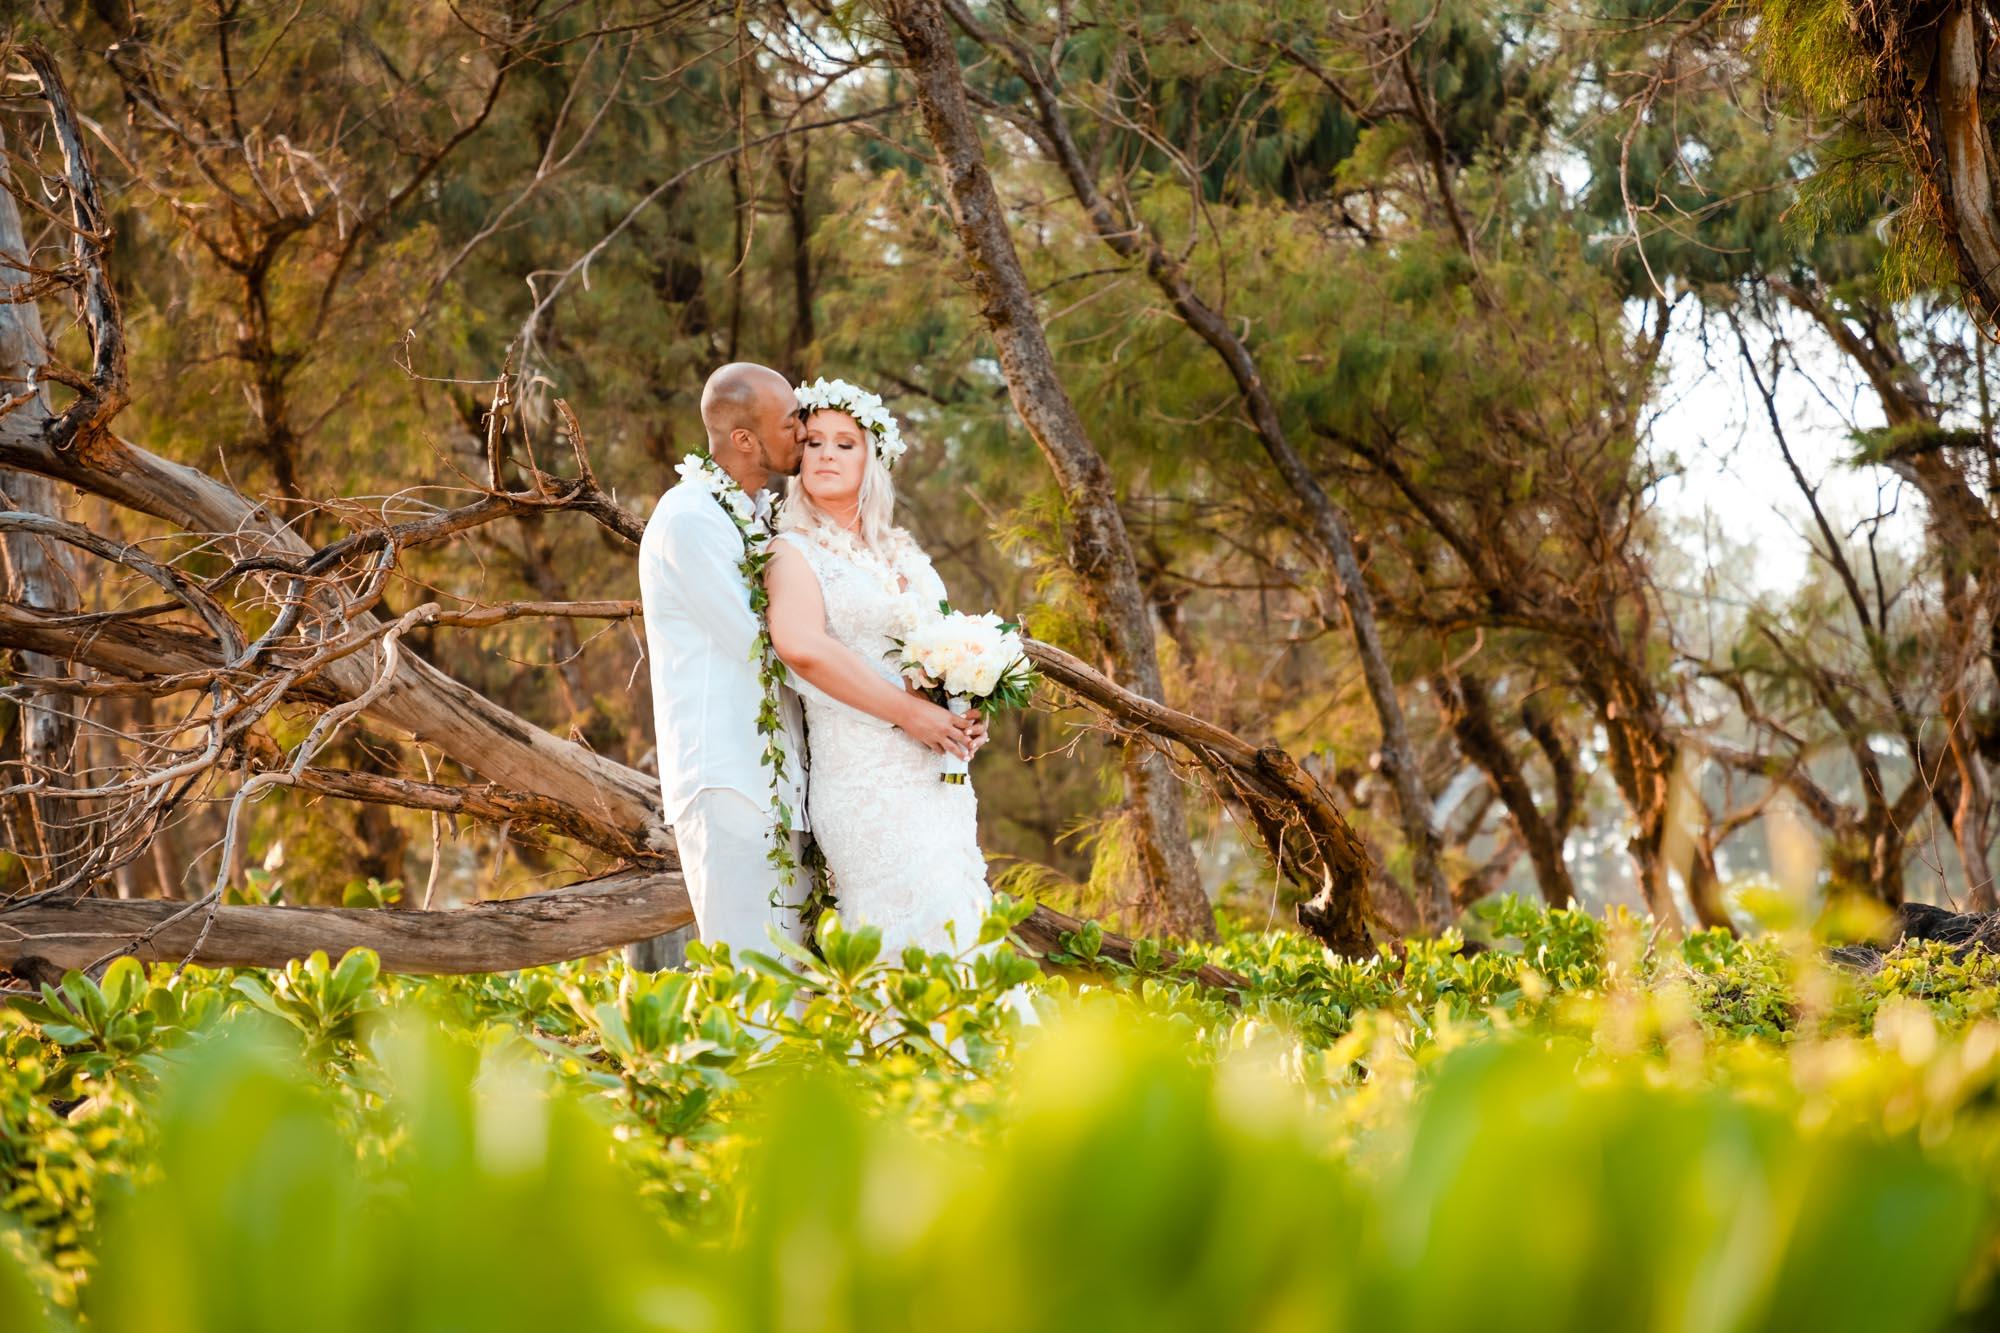 hawaii wedding bride groom portrait forest